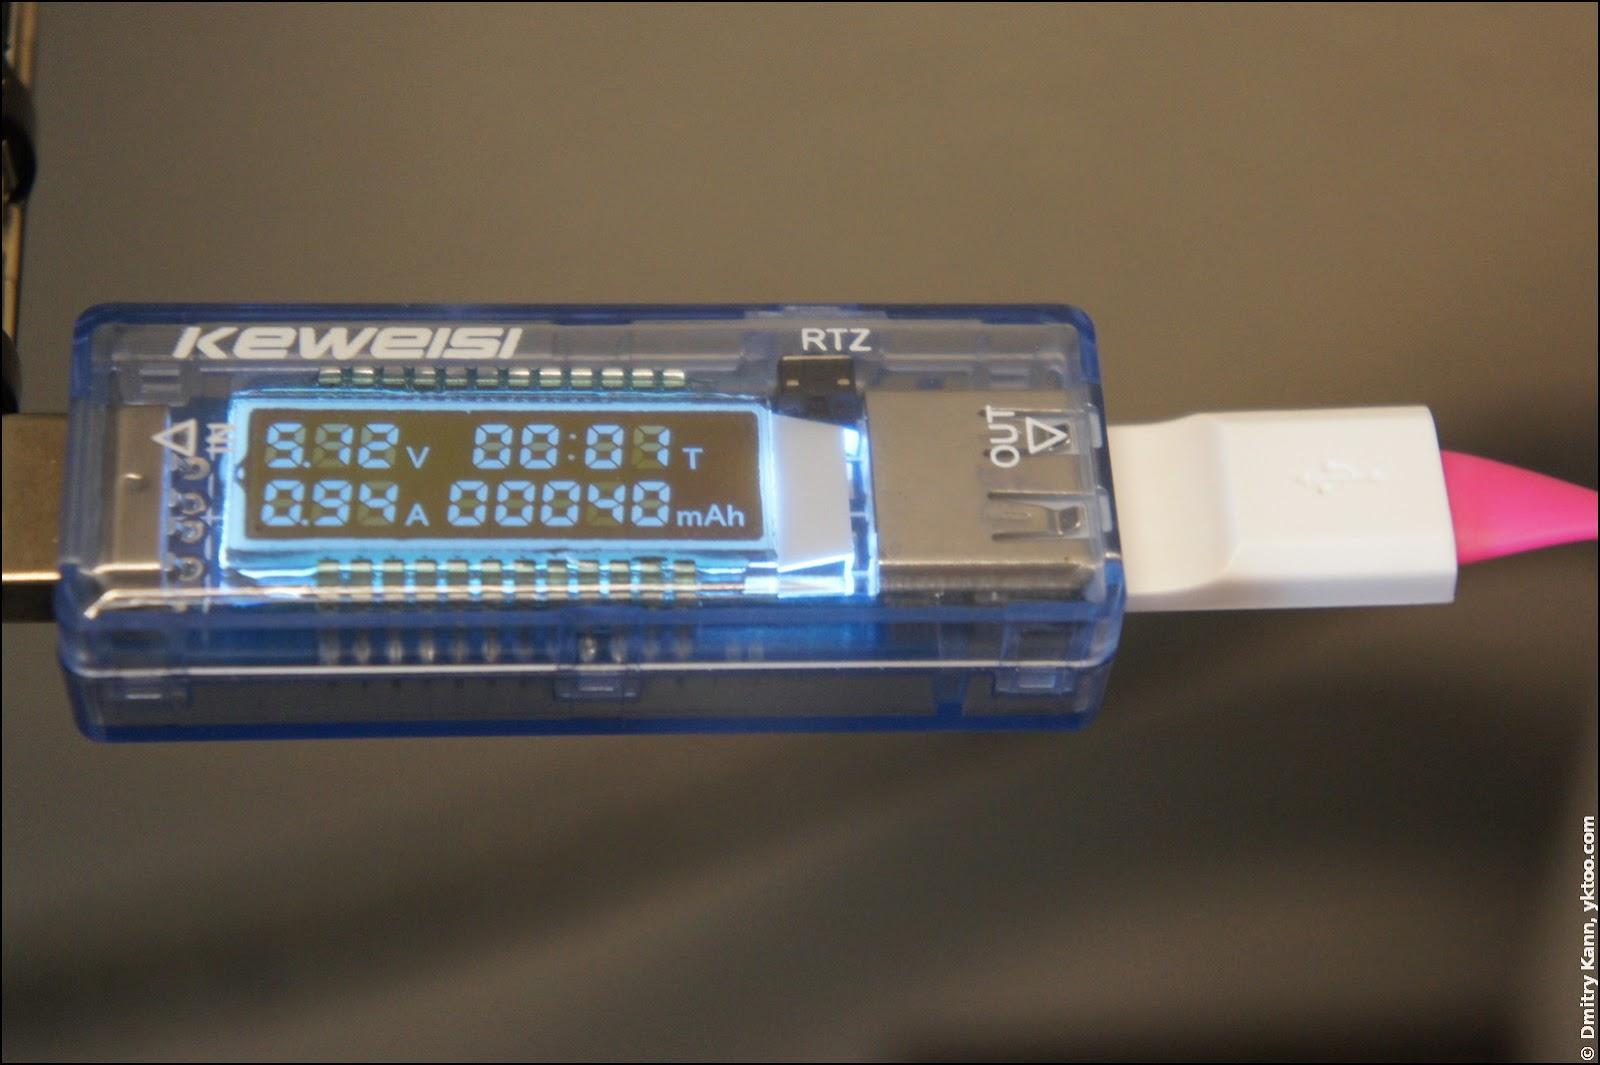 USB hub, current 0.94 A.